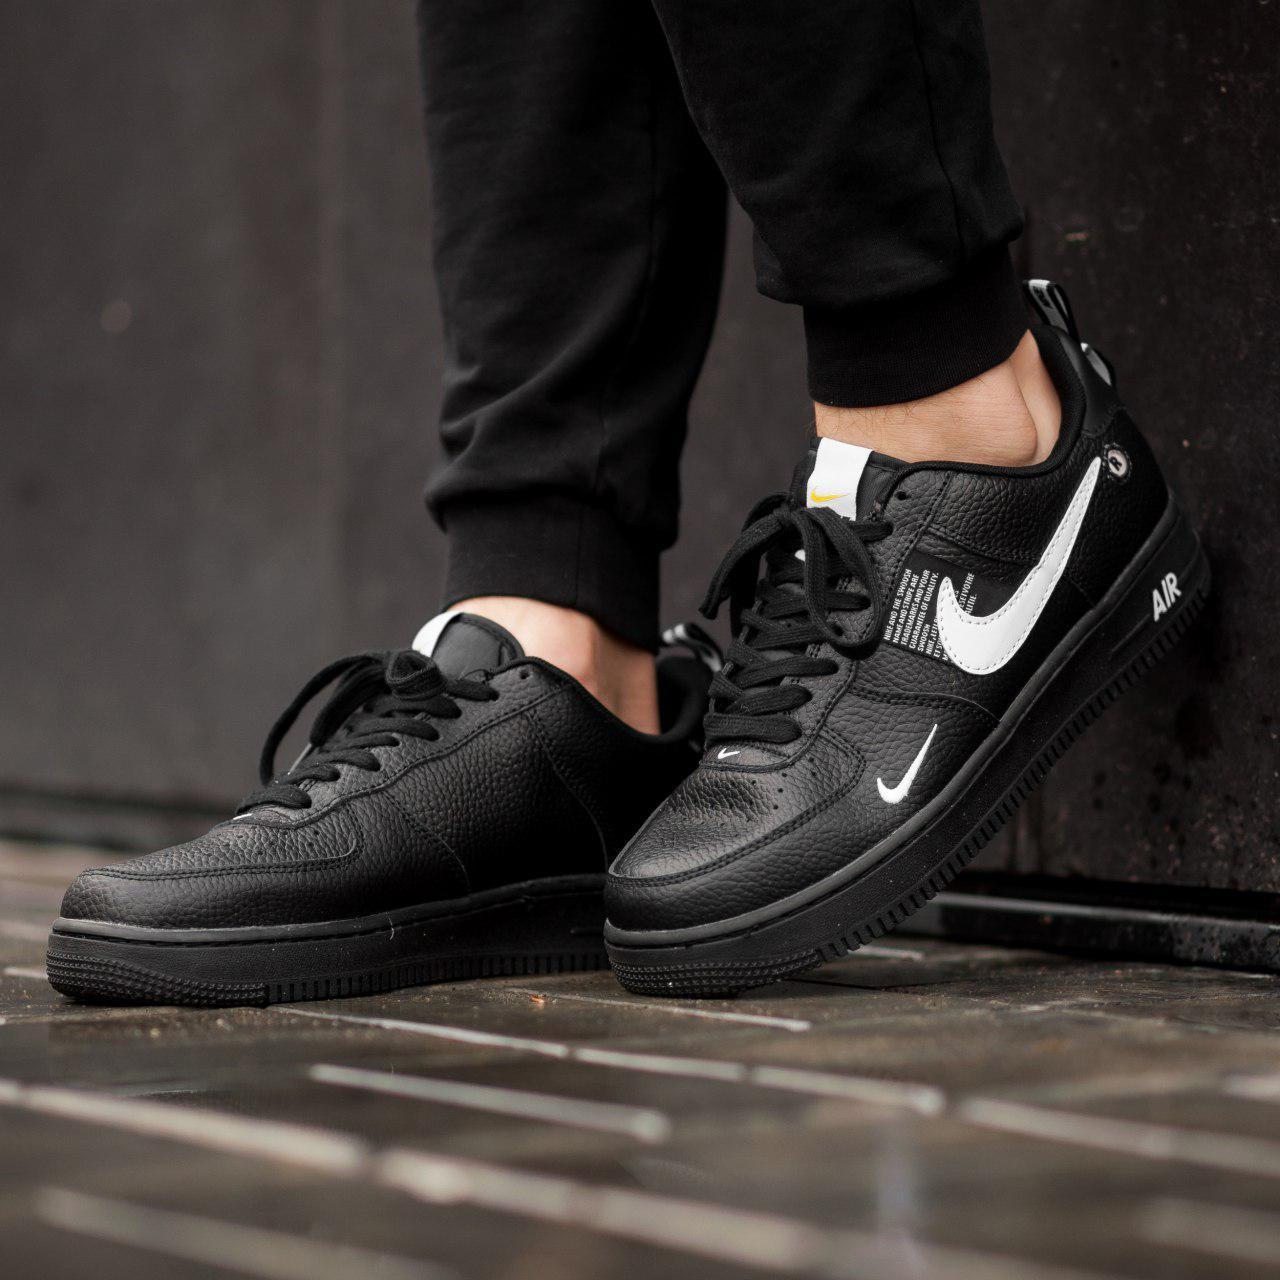 Кроссовки мужские в стиле Nike Air Force LV8 Utility Black (Реплика ААА+)